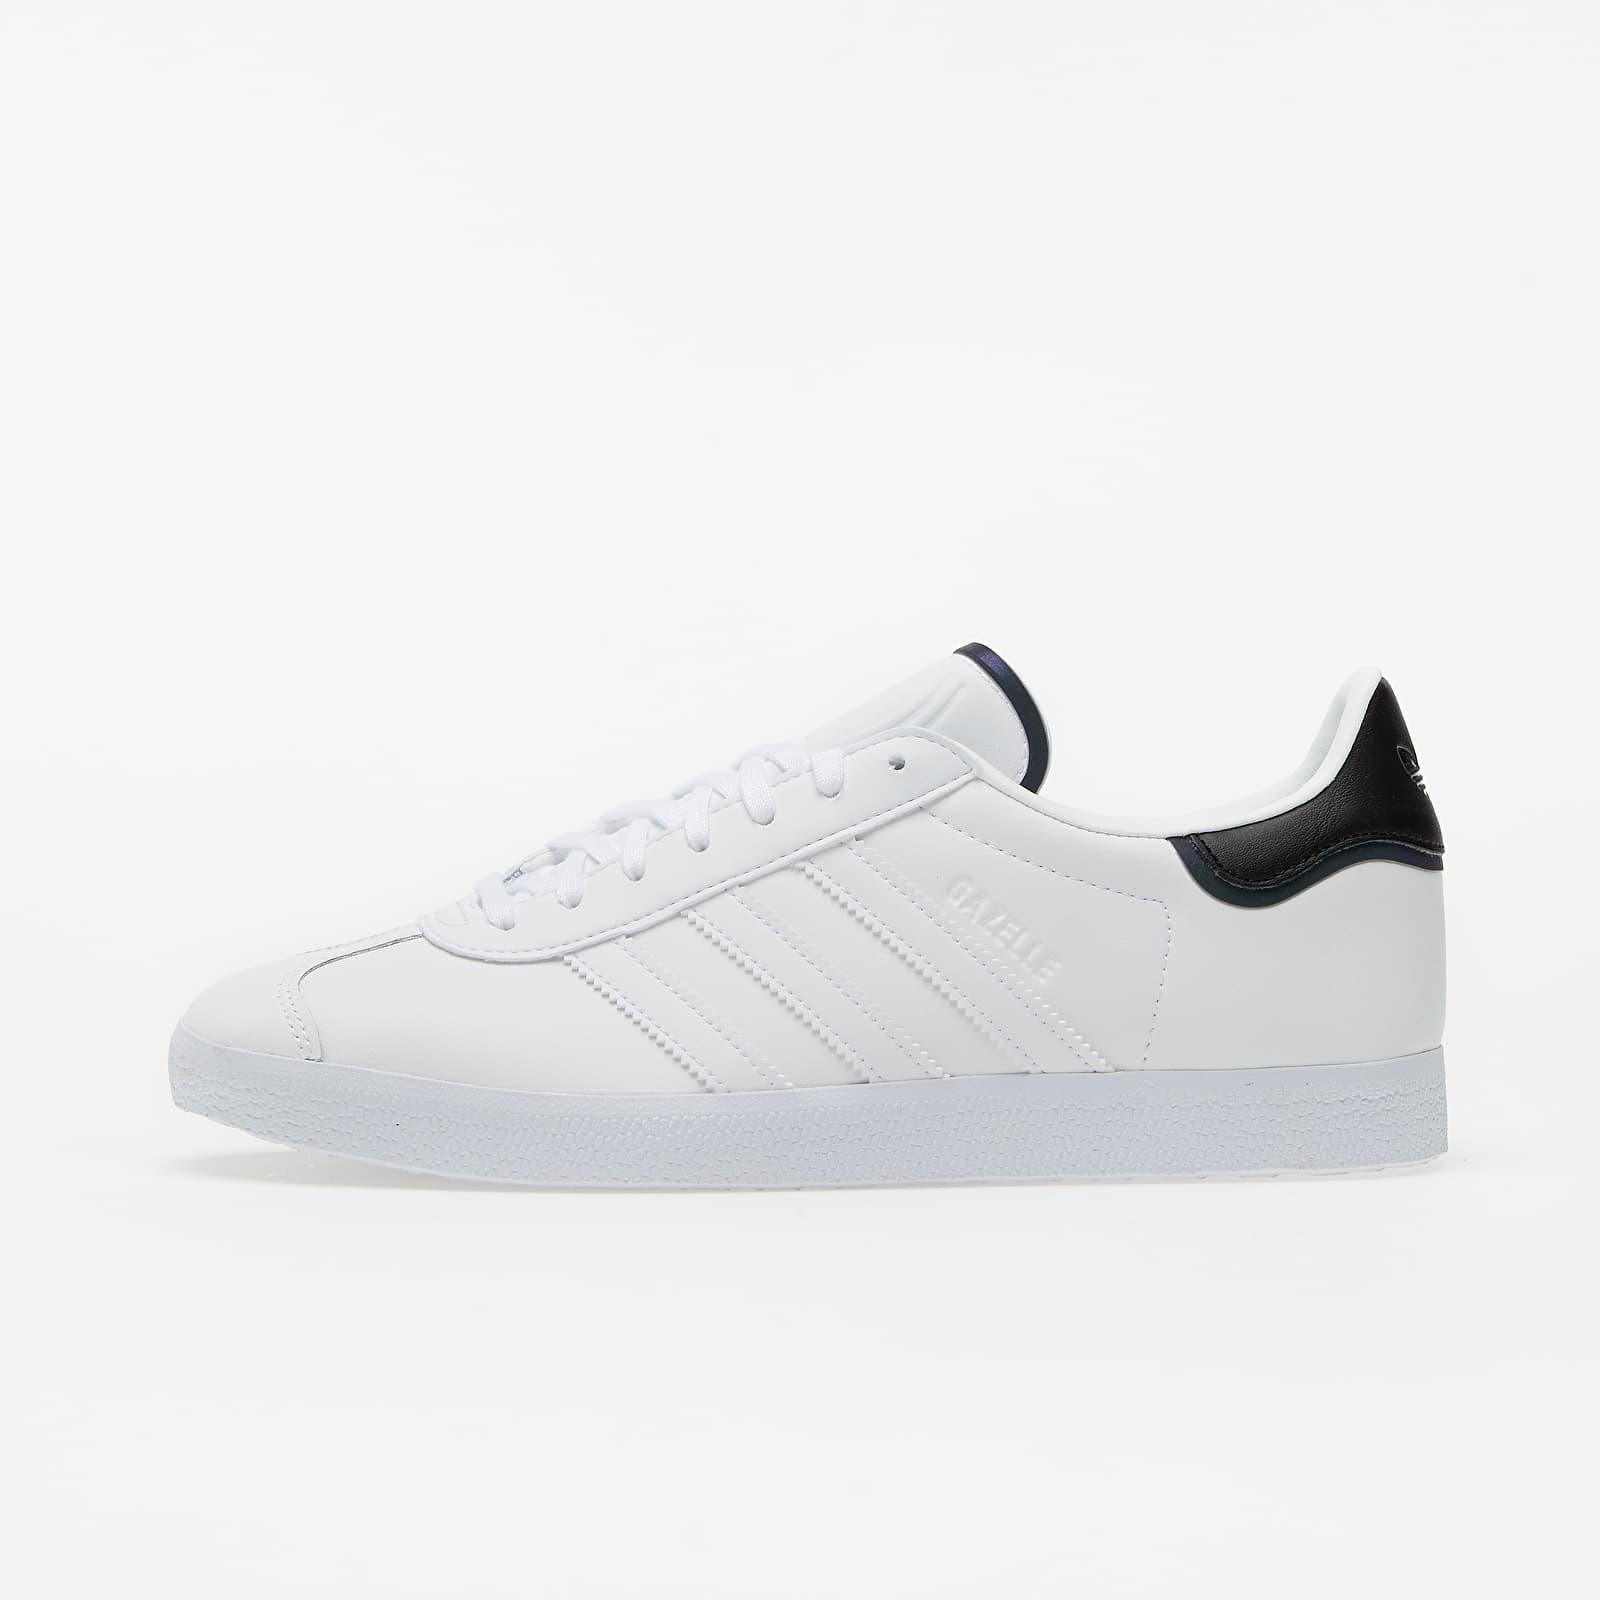 Muške tenisice adidas Gazelle Ftw White/ Ftw White/ Core Black